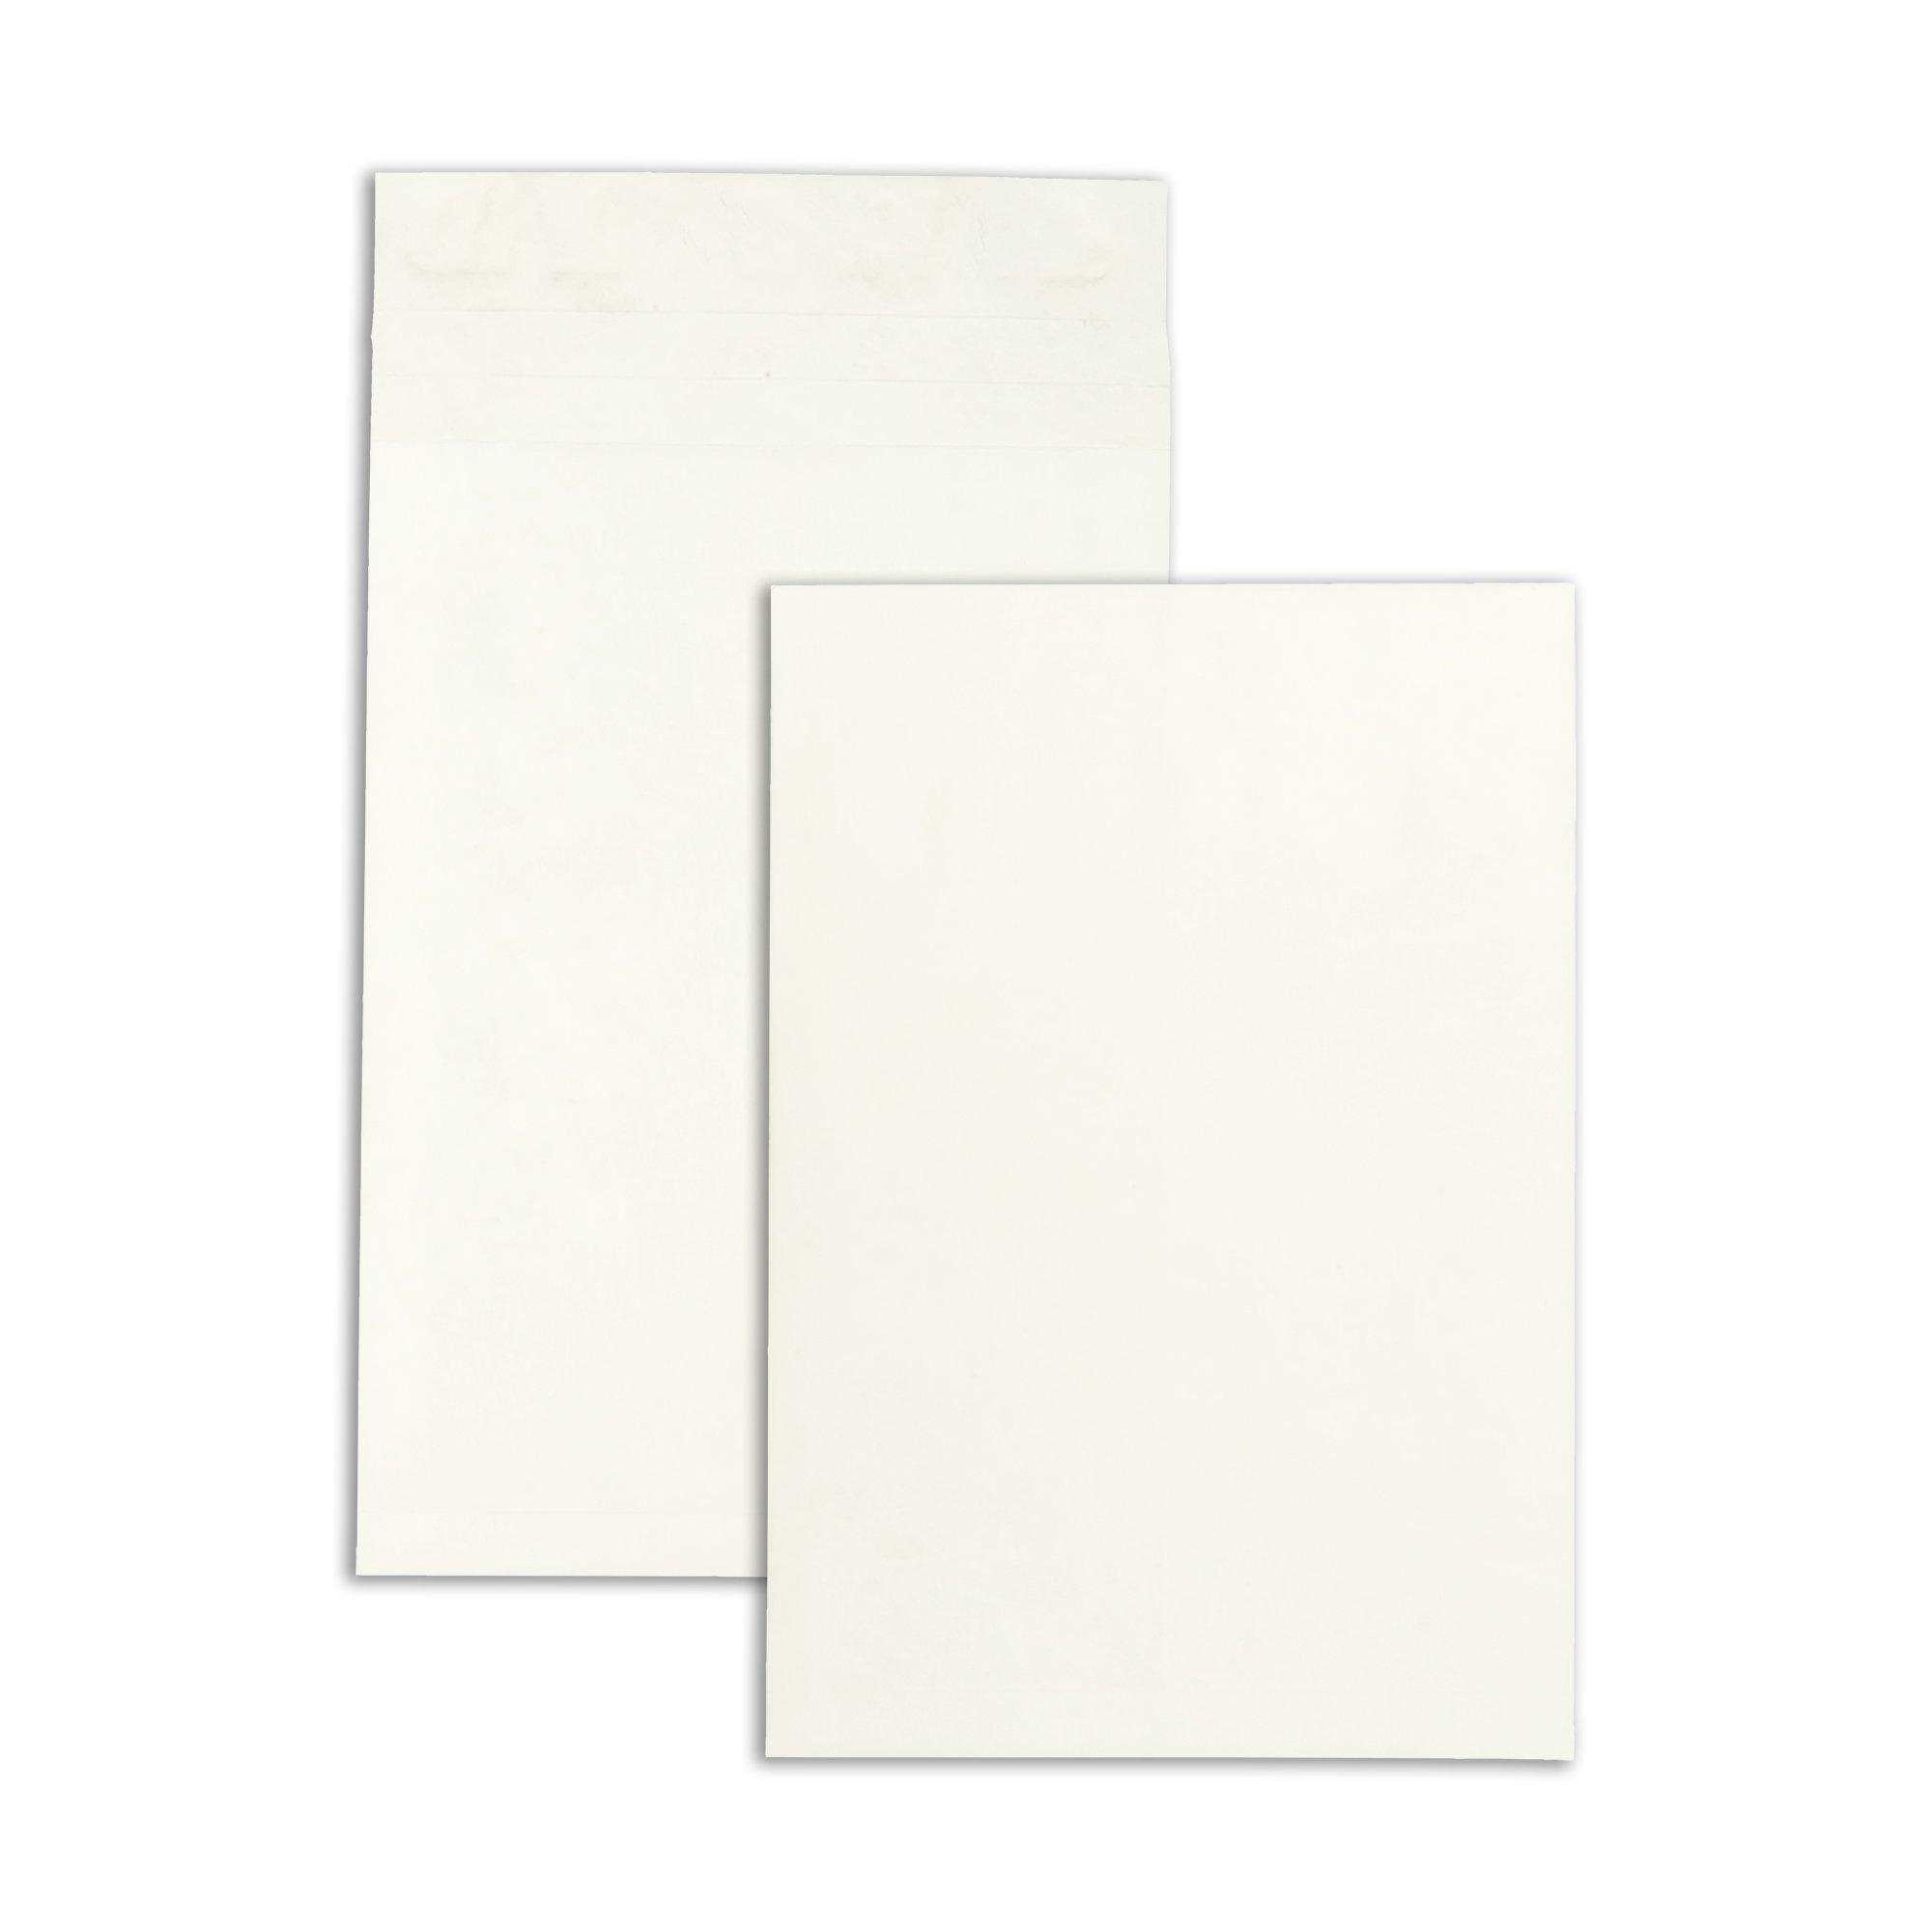 Survivor R4290 Tyvek Expansion Mailer, 12 x 16 x 2, White, 18lb (Case of 100)